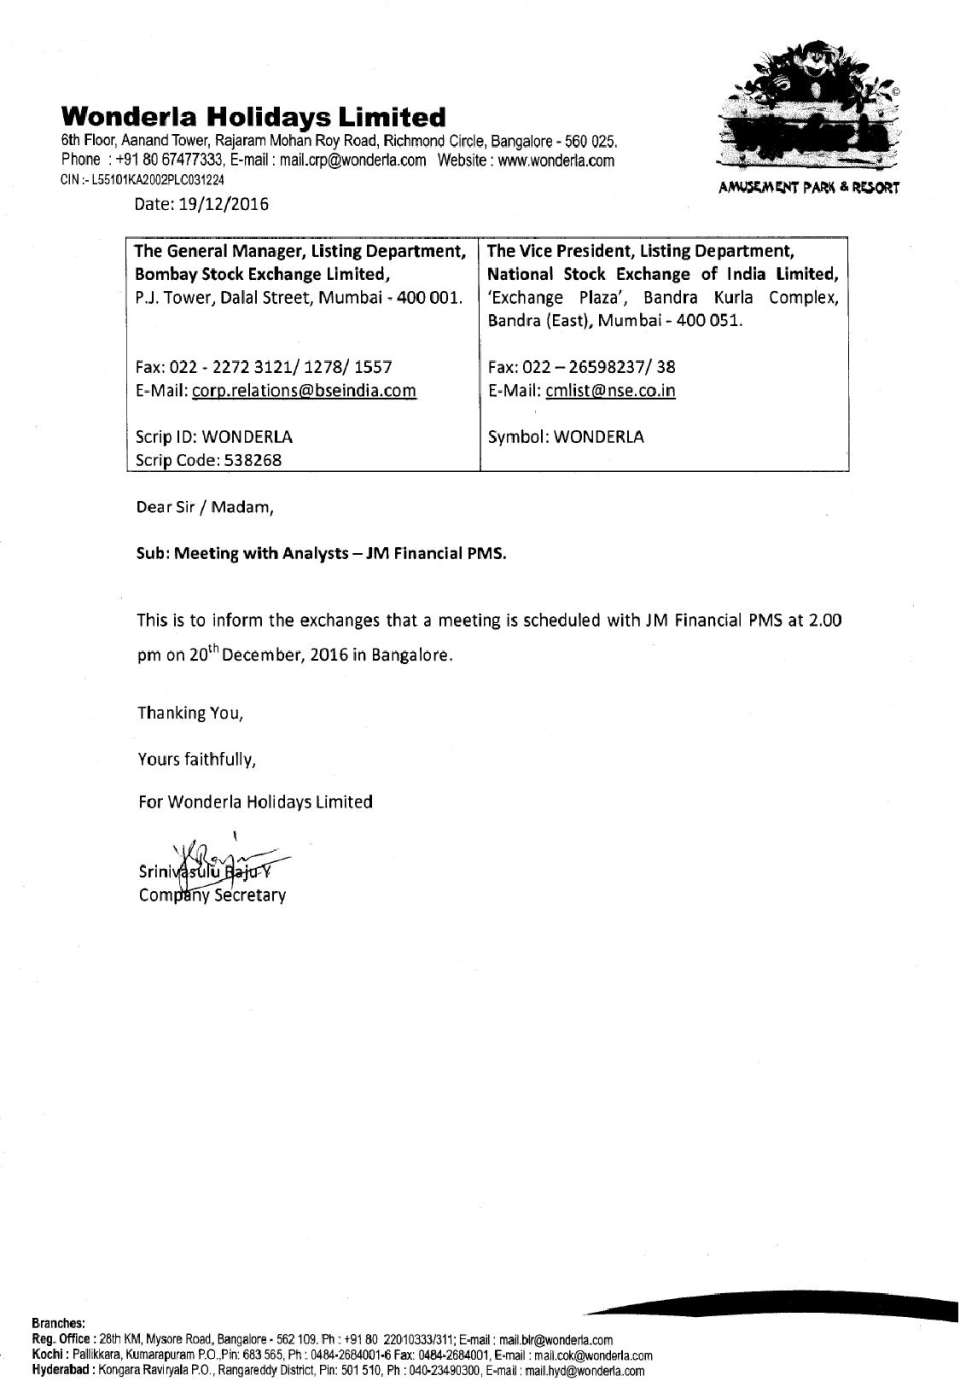 Wonderla Amusement Parks & Resort  Meeting with Analysts-JM Financial PMS-page-001